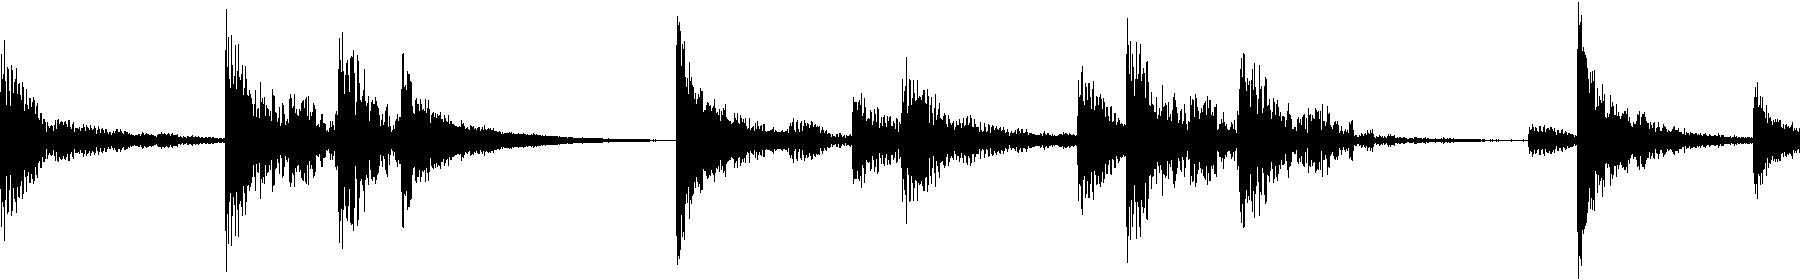 g abs05 089